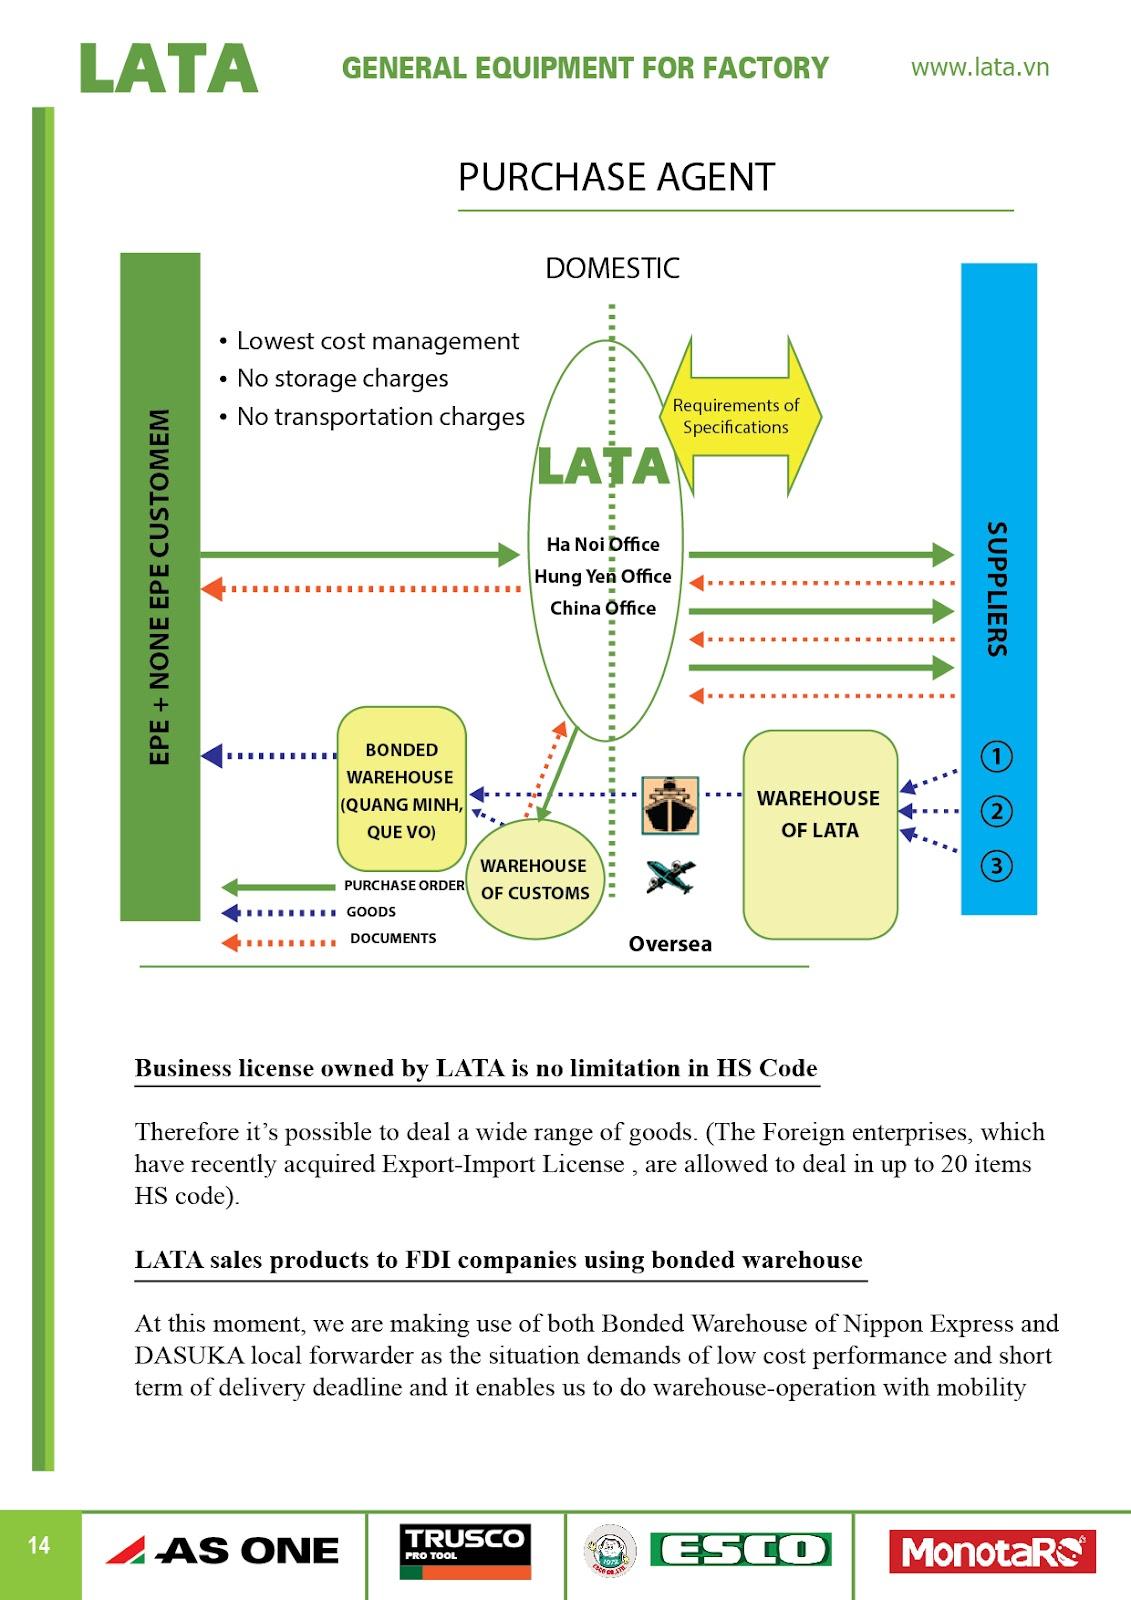 Catalogue LATA (T11)_14.jpg